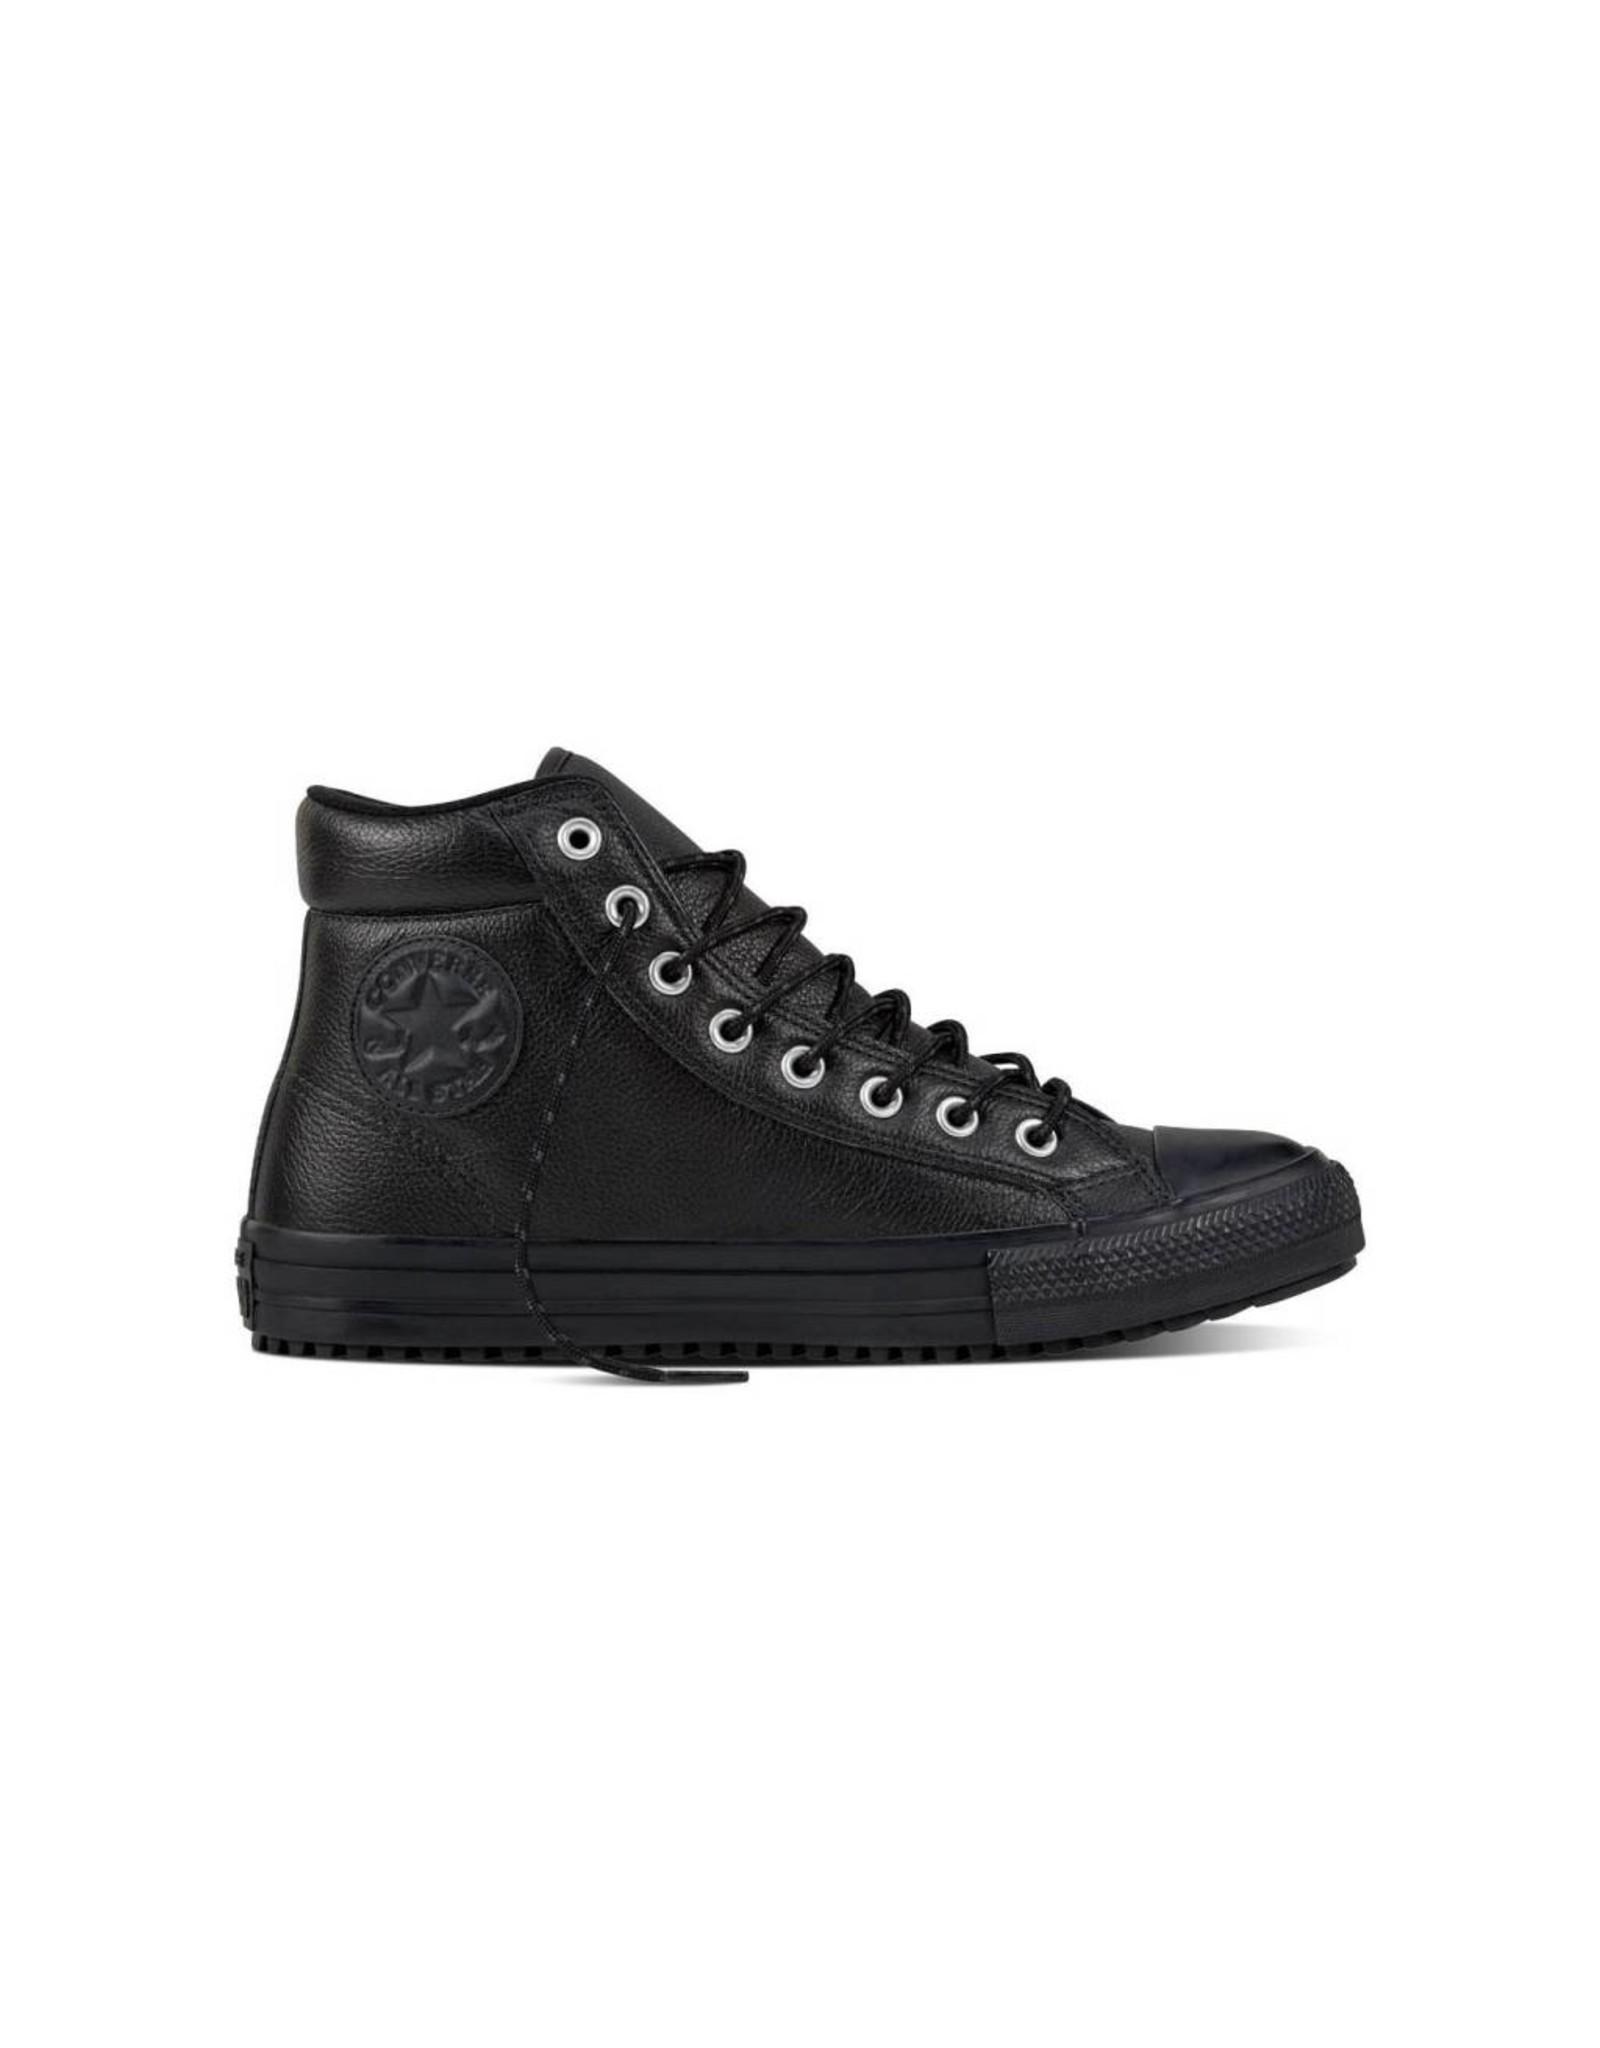 CONVERSE CHUCK TAYLOR BOOT PC HI BLACK/BLACK/BLACK CC797MO-157686C